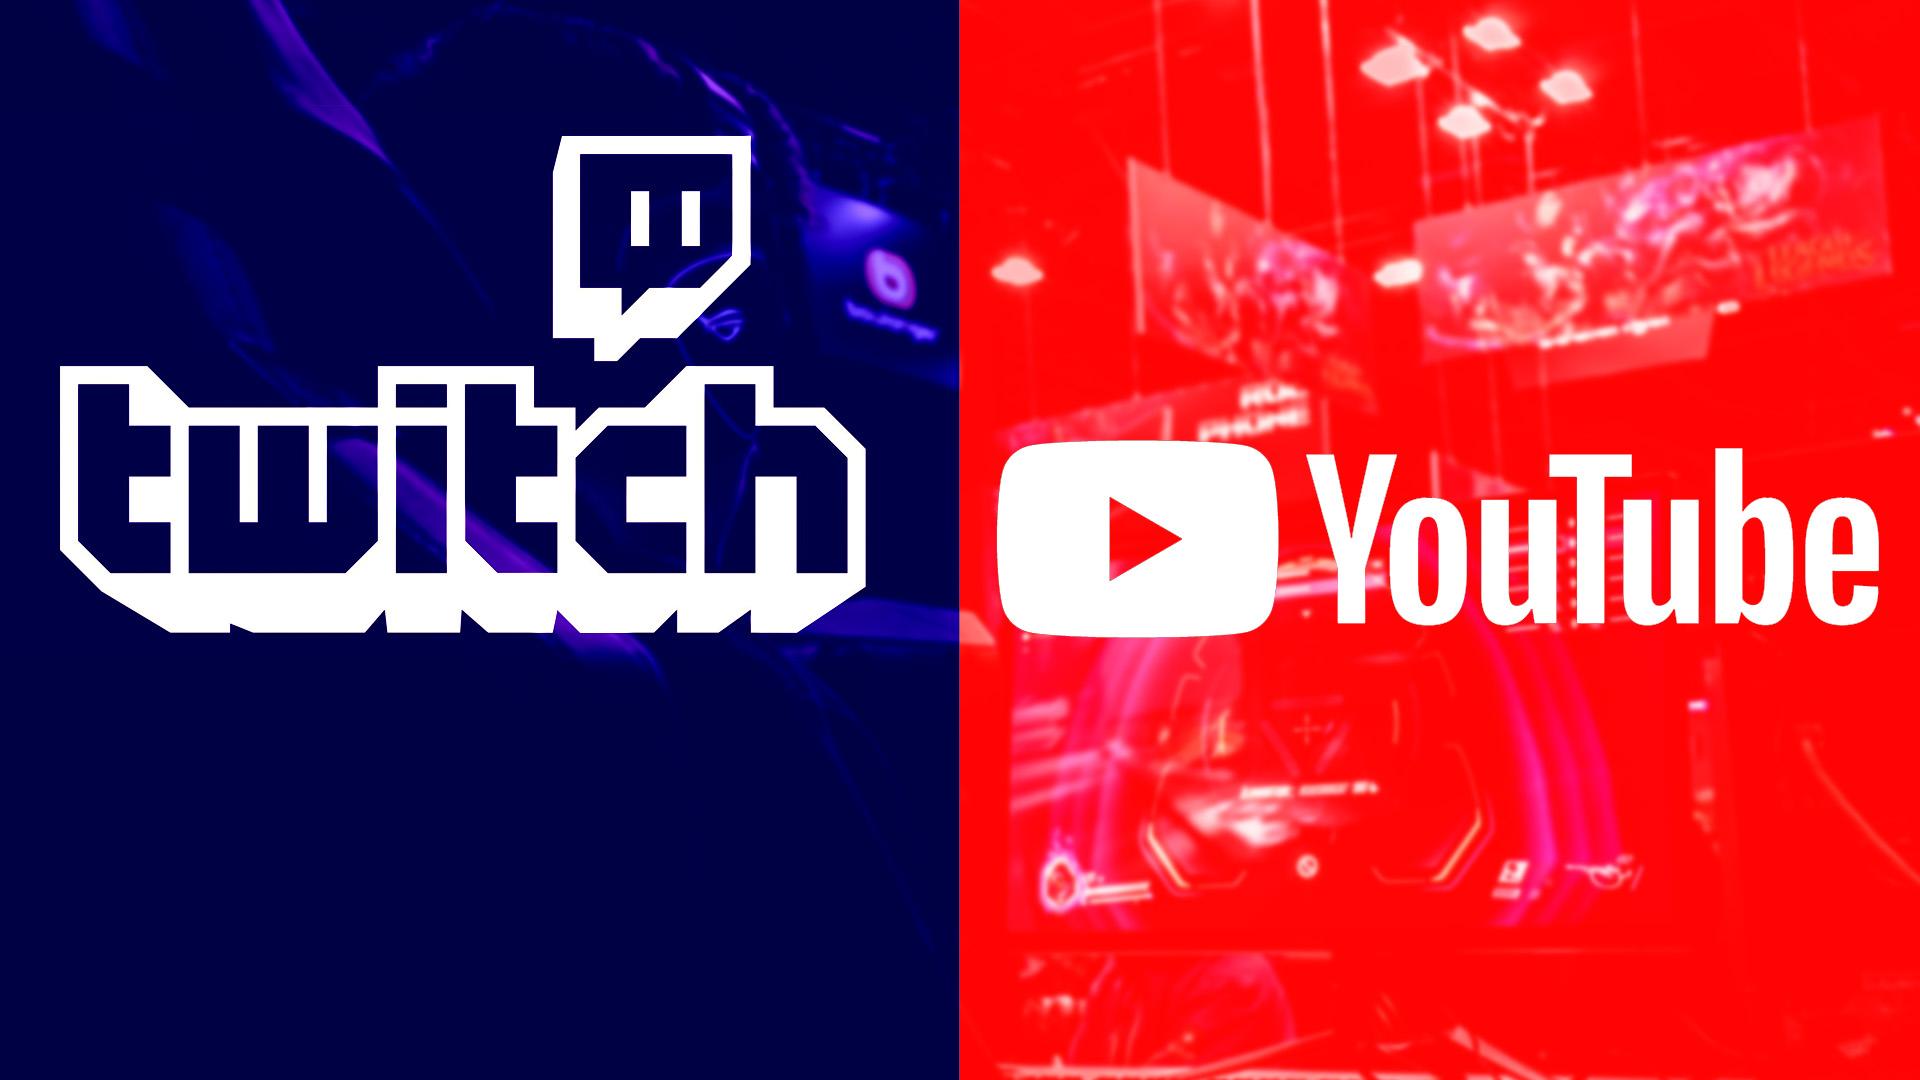 ¿Verdaderamente está Twitch desbancando a YouTube gracias al streaming de videojuegos?